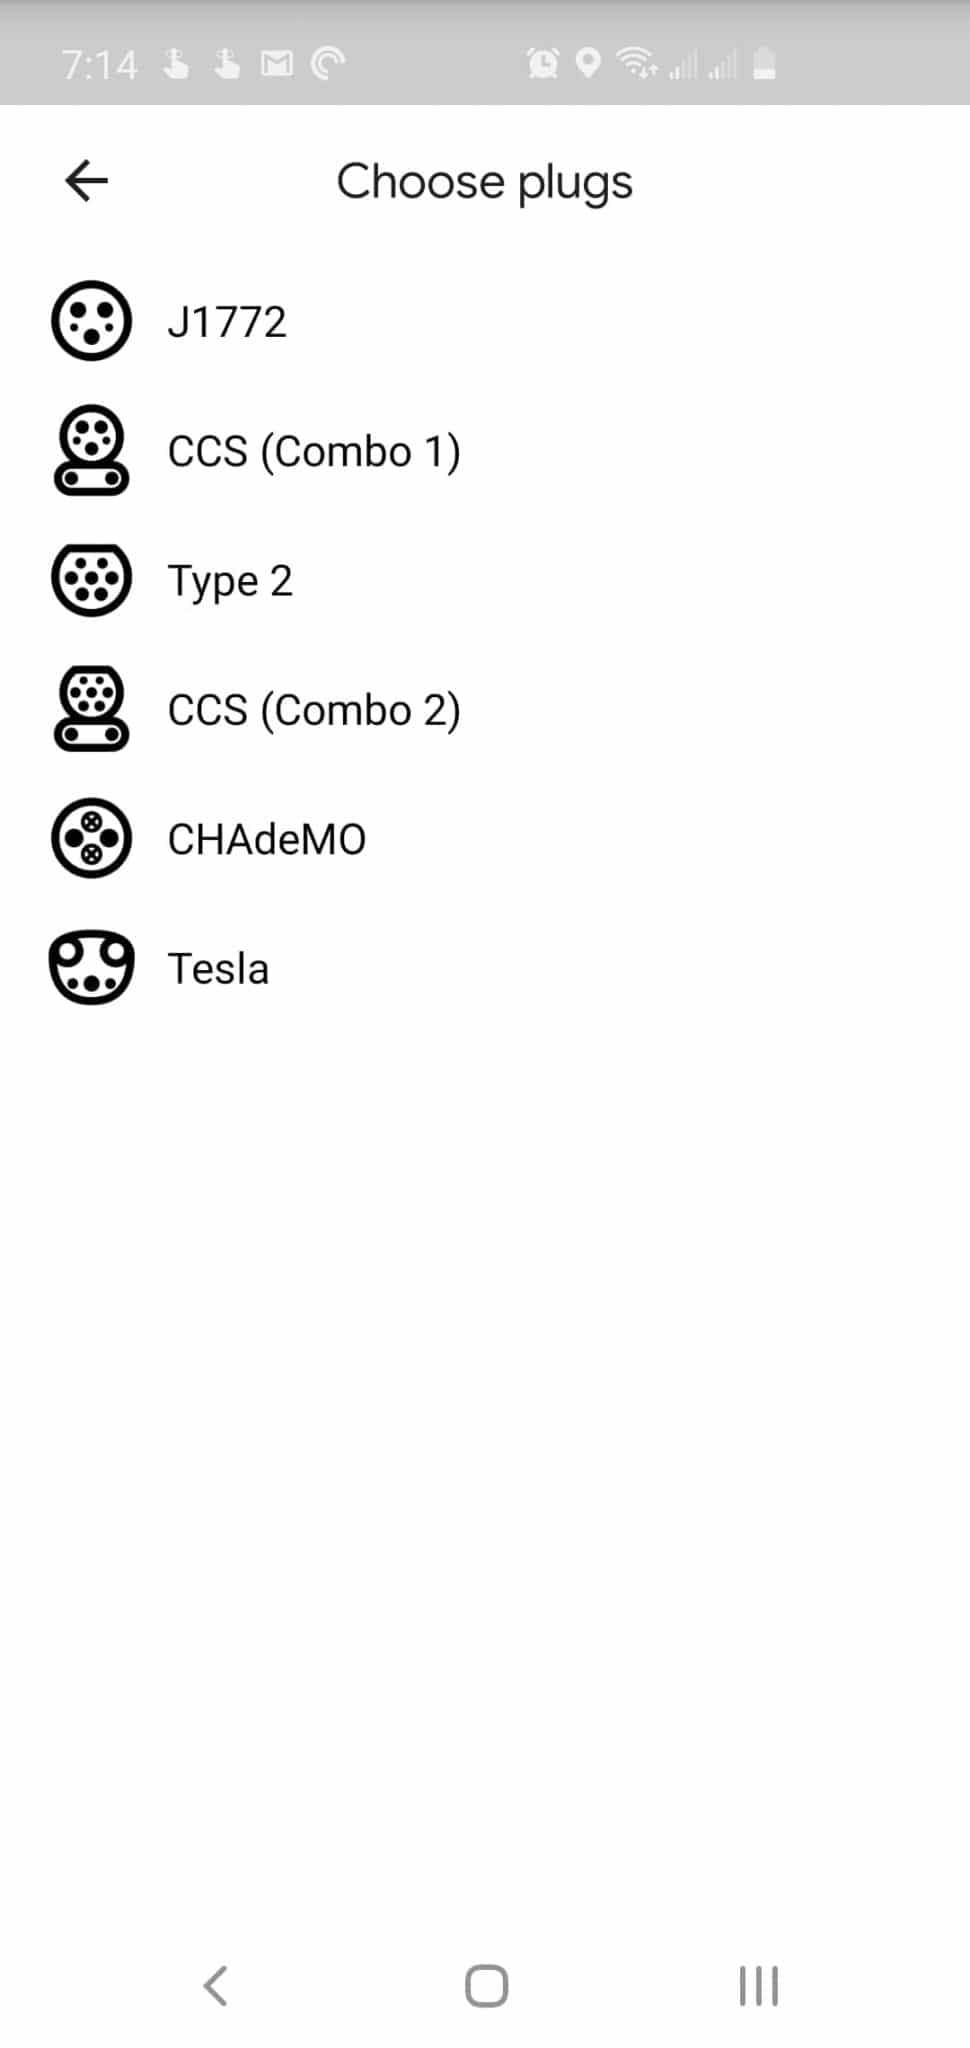 Google-Maps-elegir-tipo-cargadpr-coche-electrico